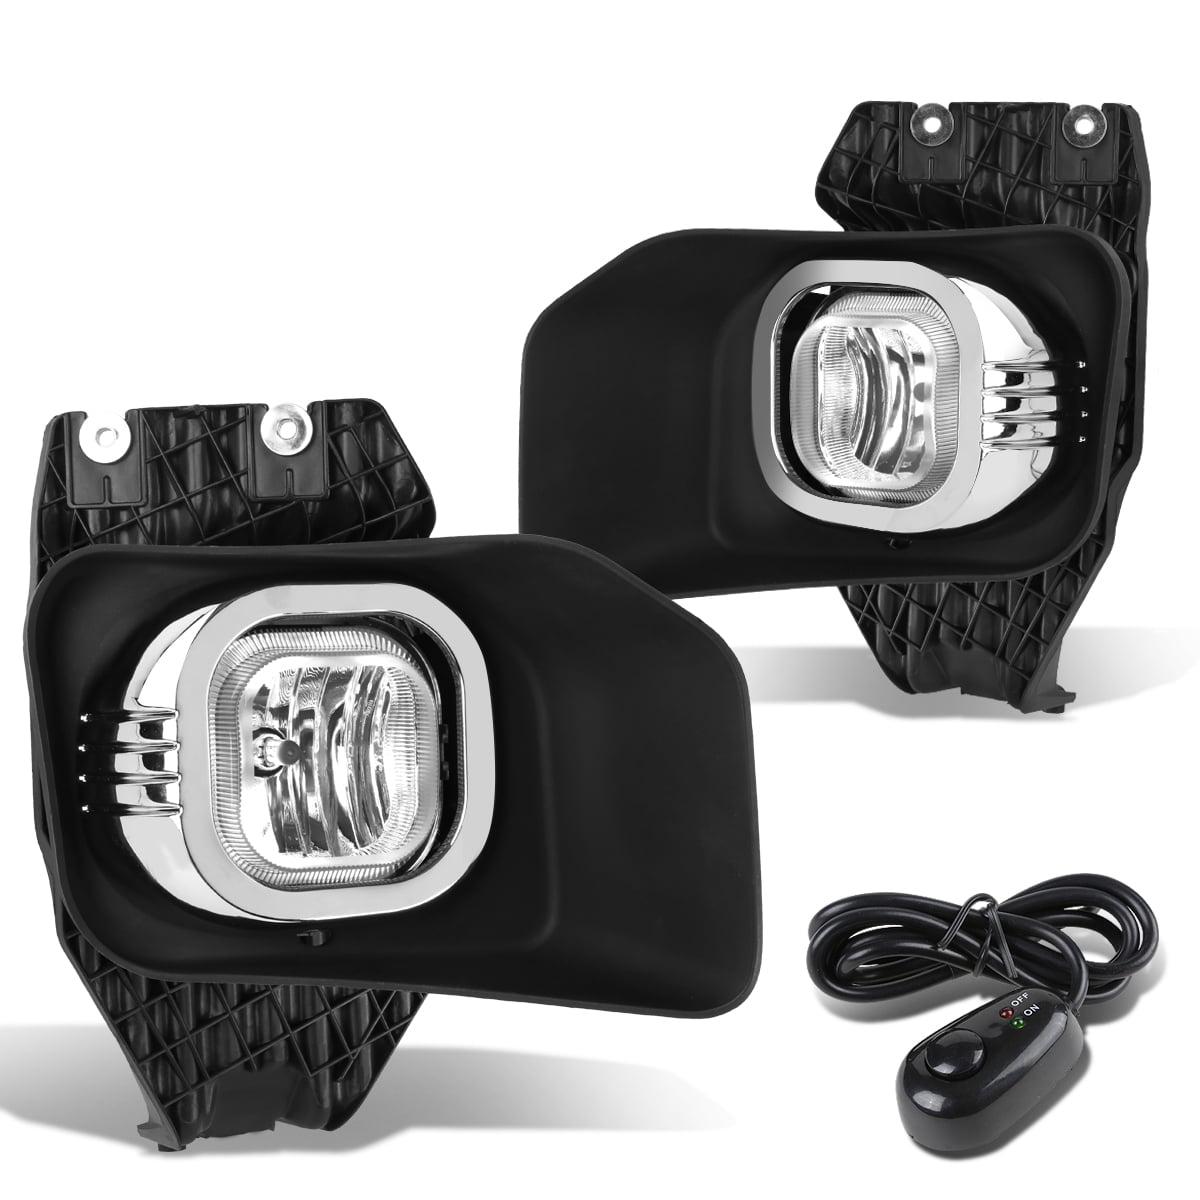 For 11-16 Ford F-250/350/450/550 Super Duty Pair Bumper Driving Fog Light/Lamp+Bezel+Switch Clear Lens 12 13 14 15